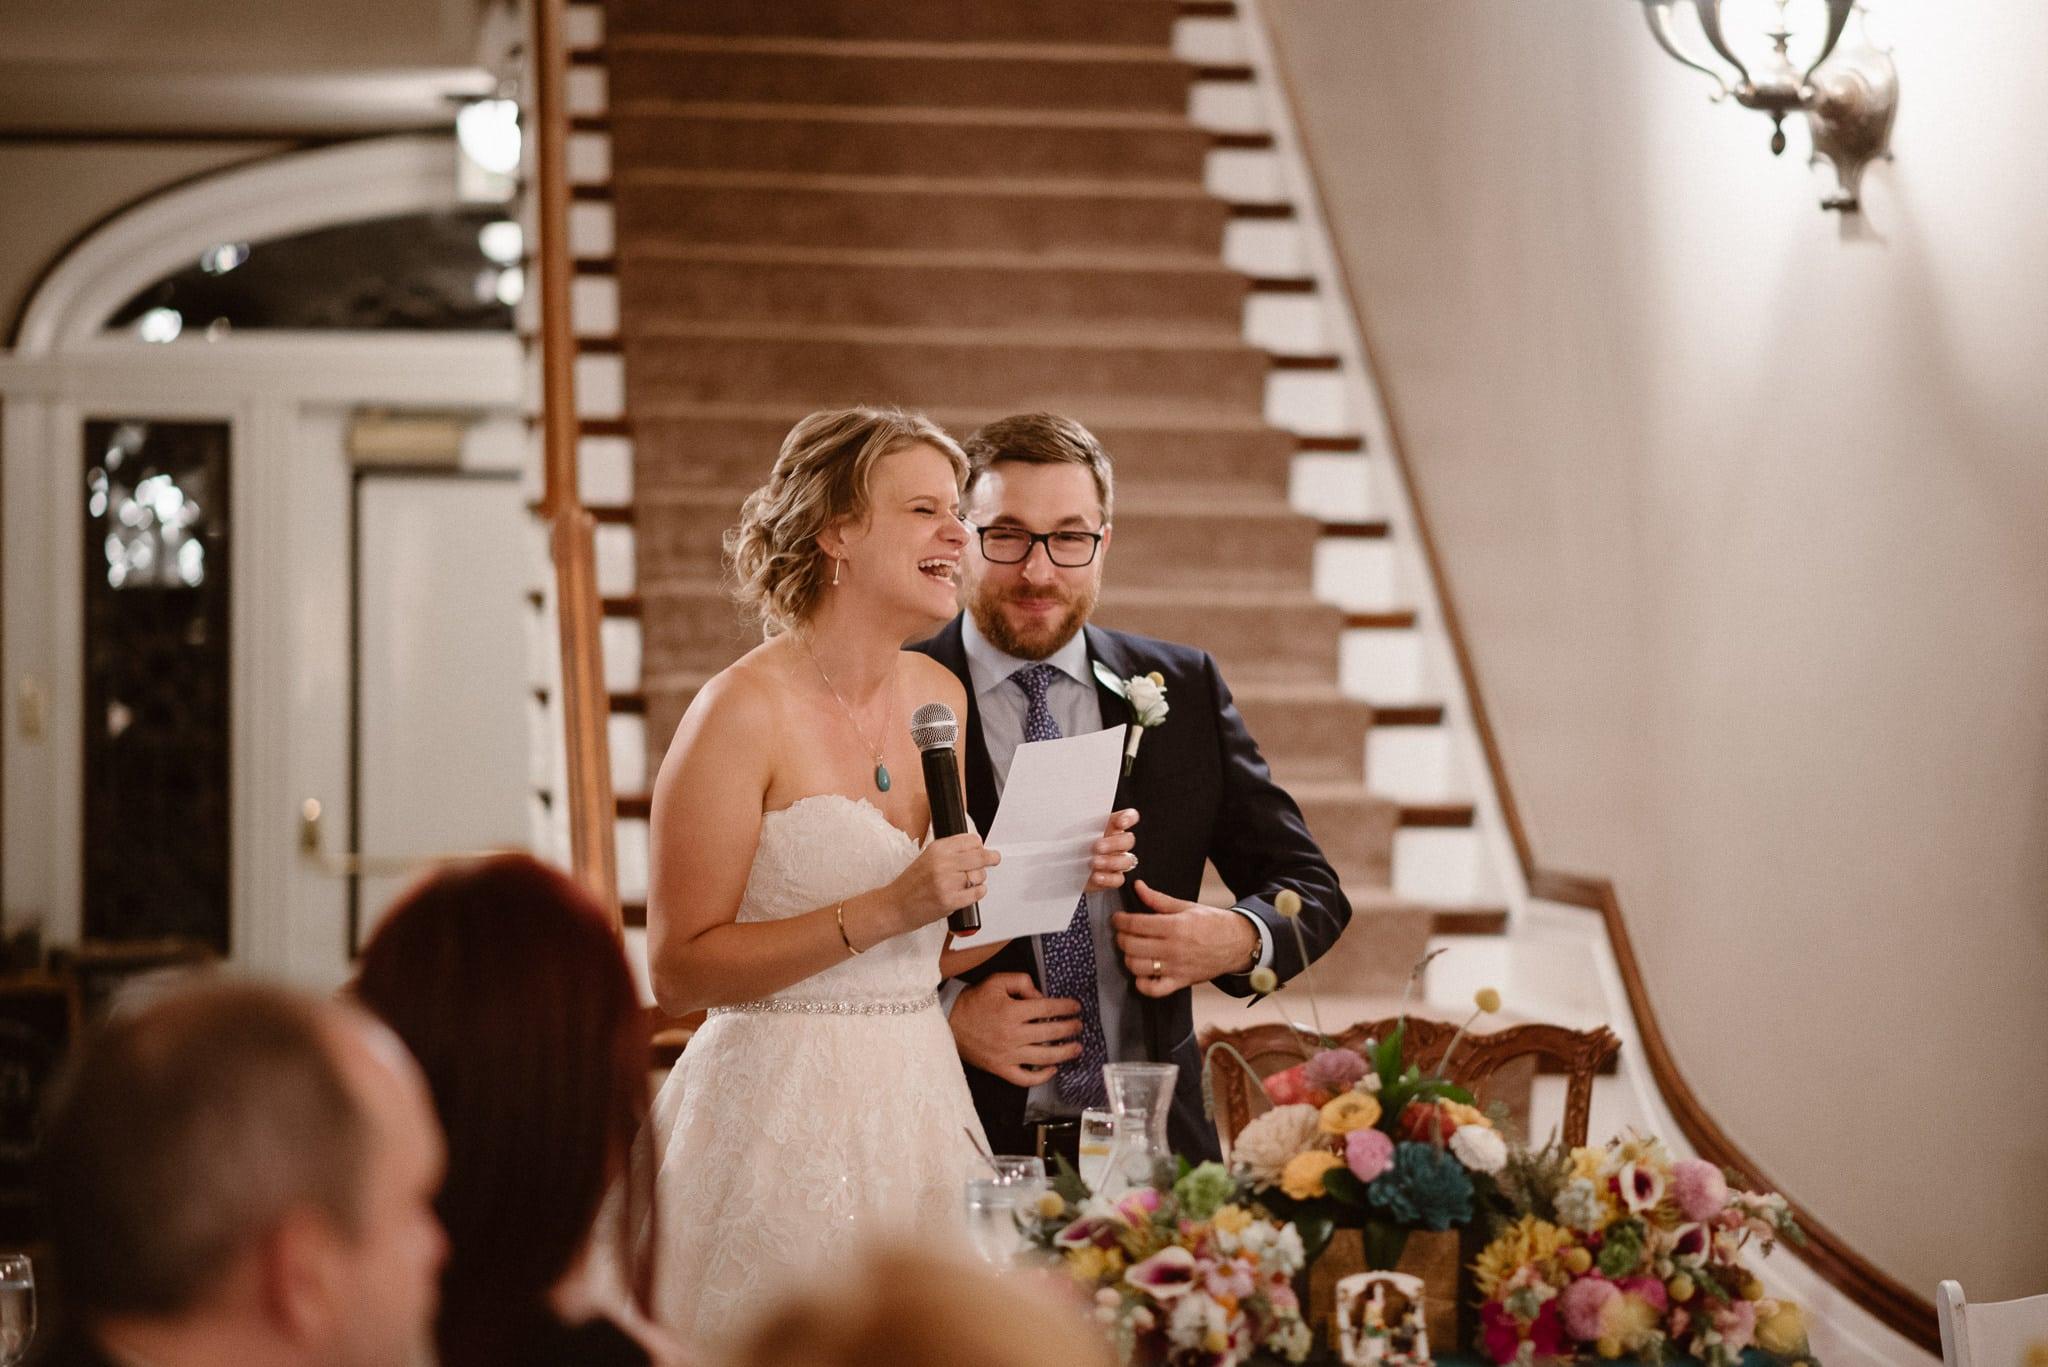 Grant Humphreys Mansion Wedding Photographer, Denver wedding photographer, Colorado wedding photographer, wedding toasts